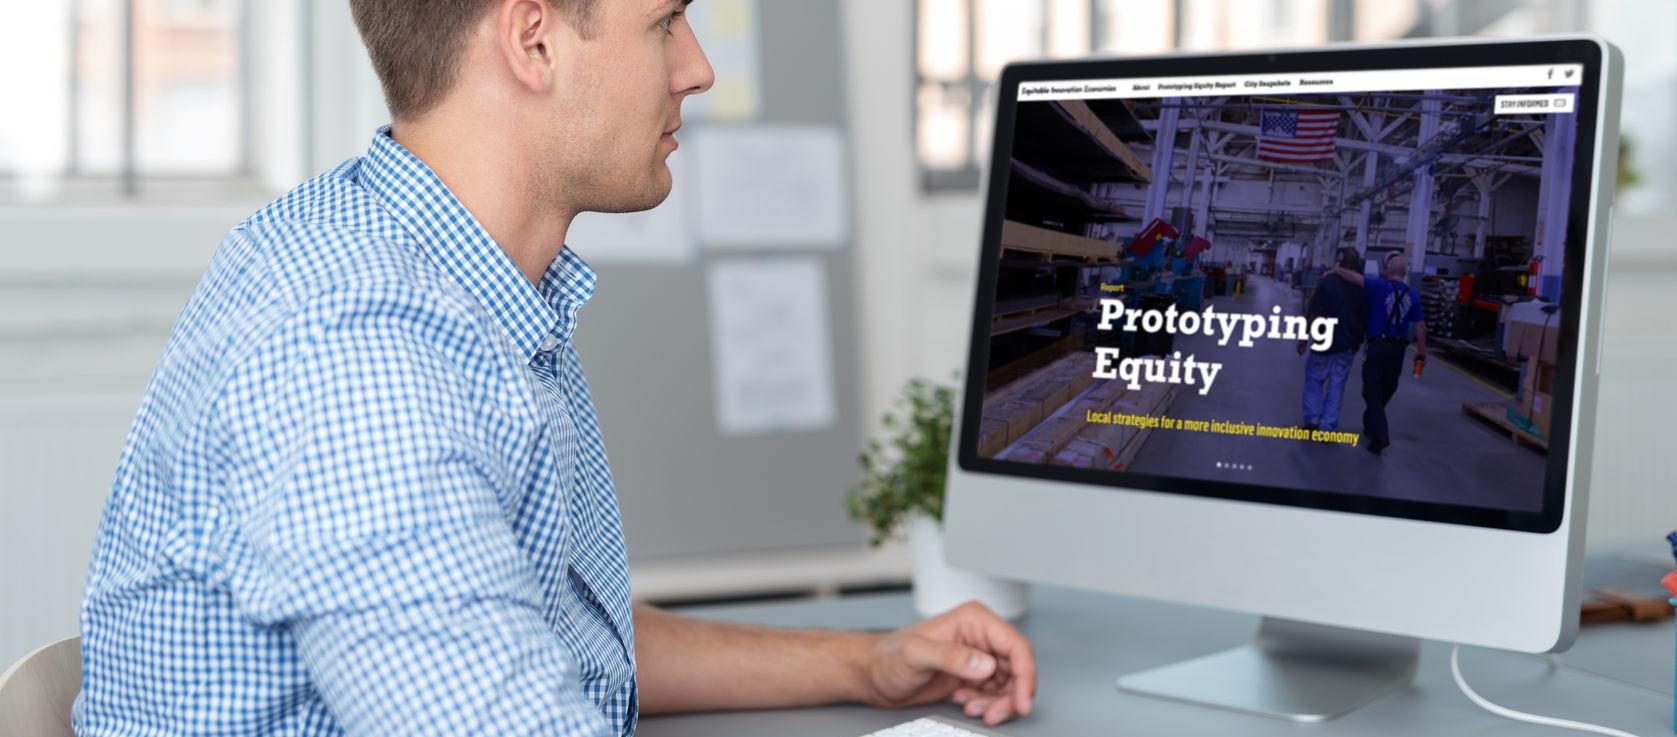 Equitable Innovation Economies website